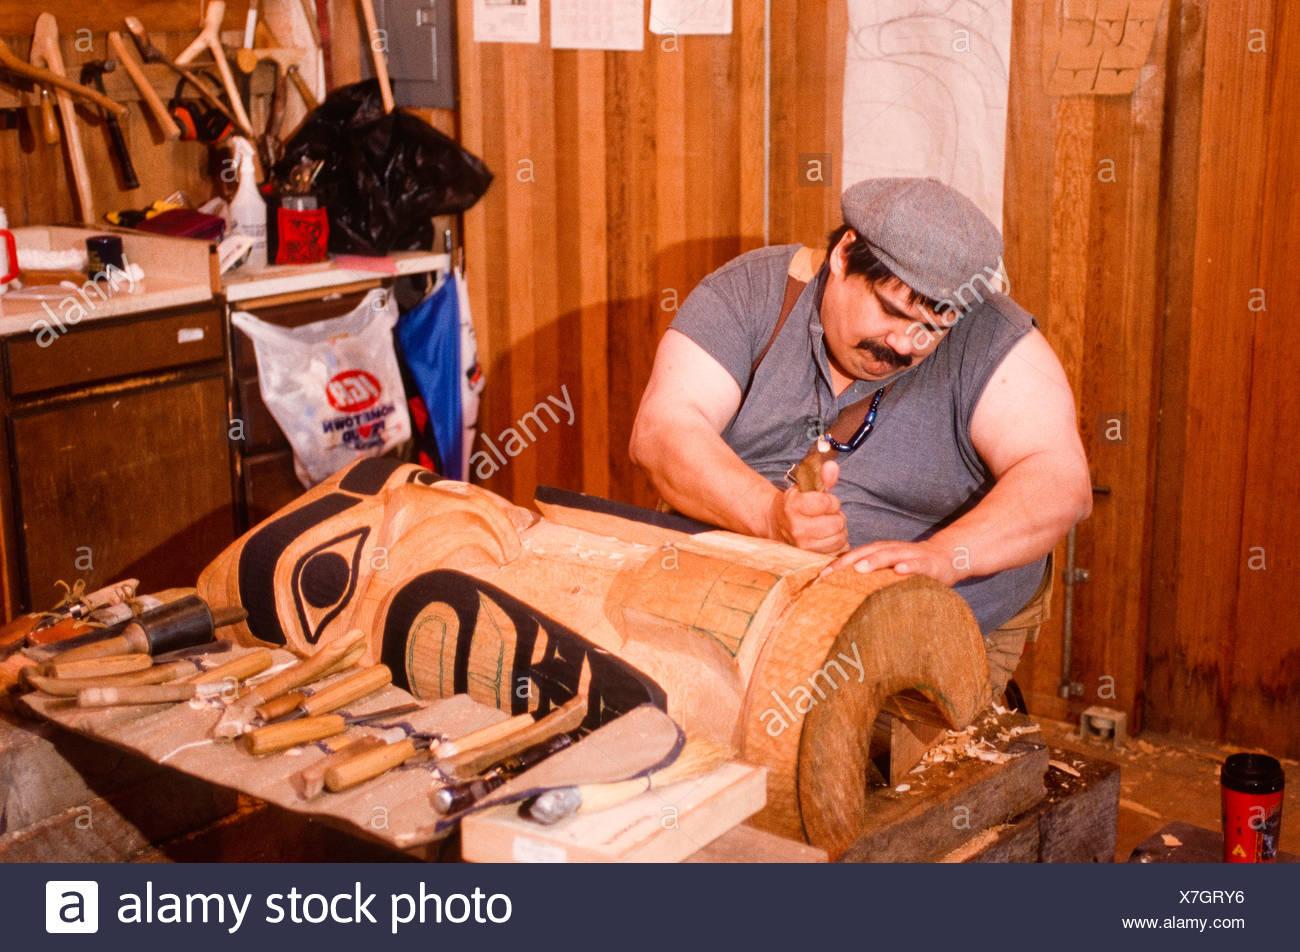 Tlingit carver J. Darald Dewitt at work on a totem at his Ketchikan workshop. - Stock Image